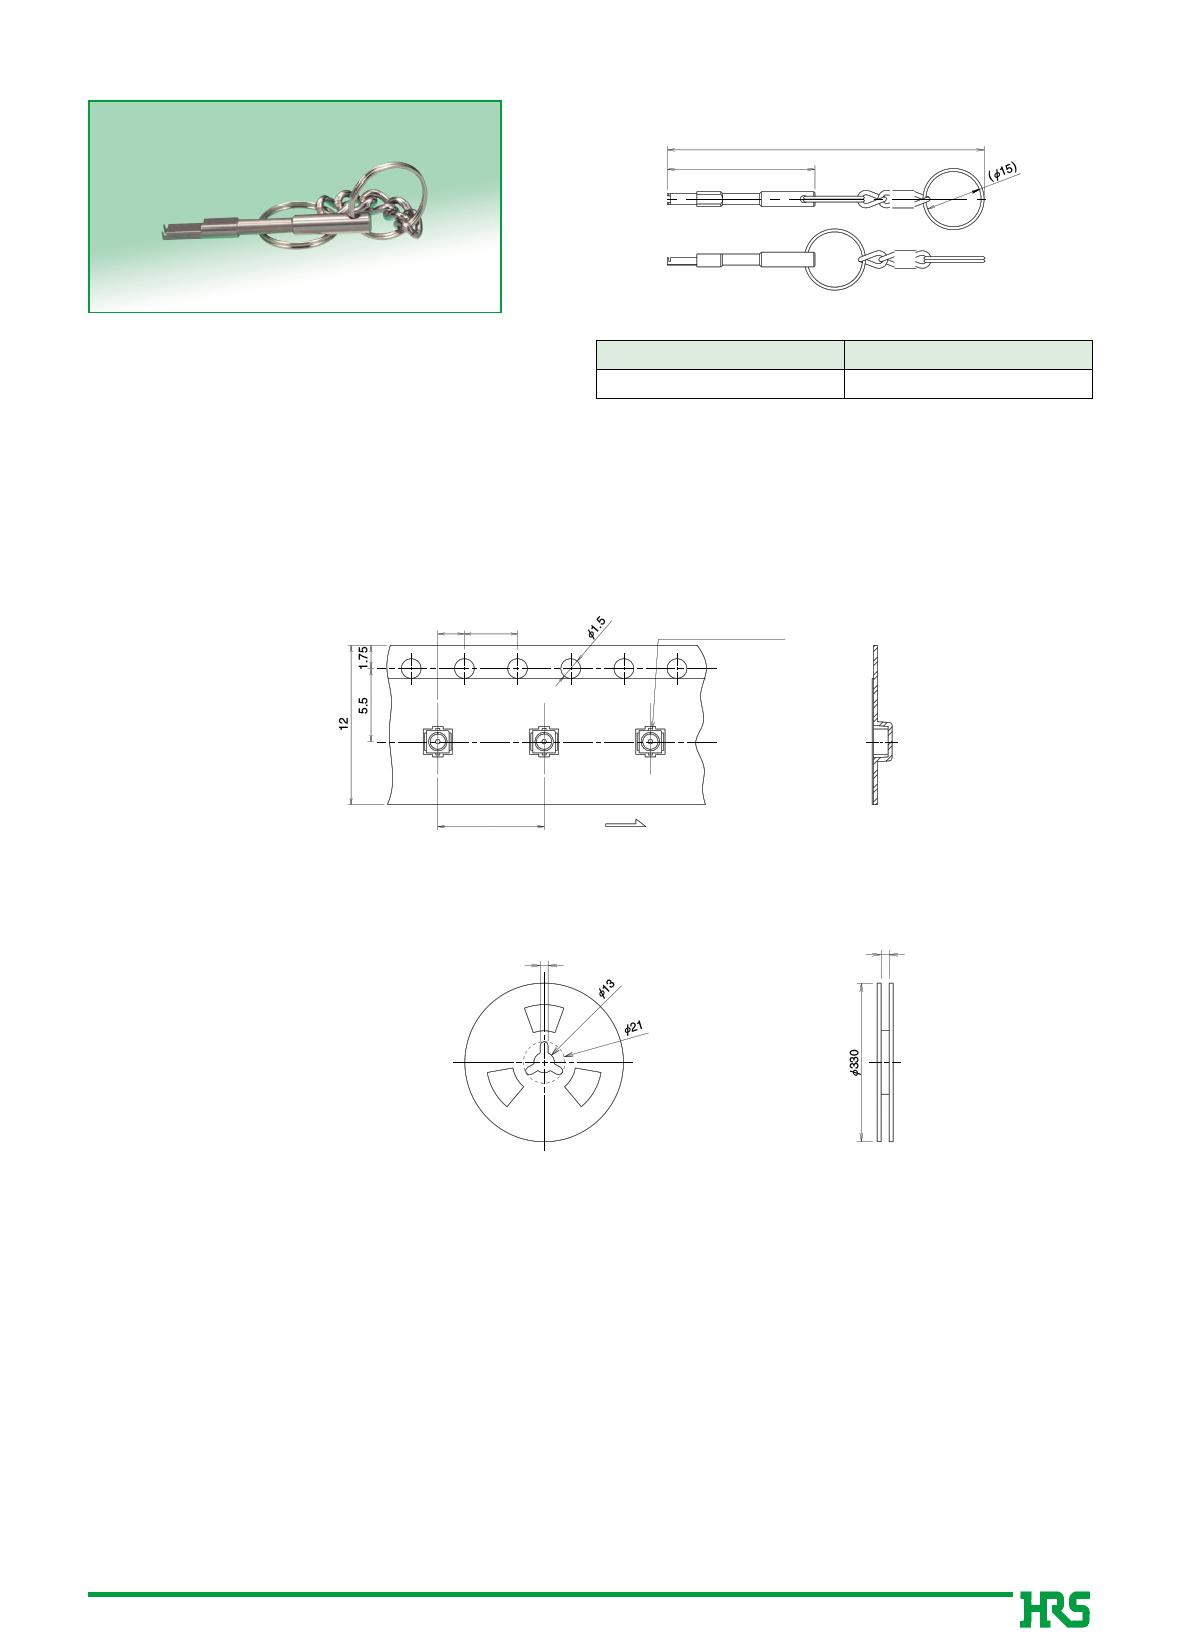 W.FL-R-1 pdf